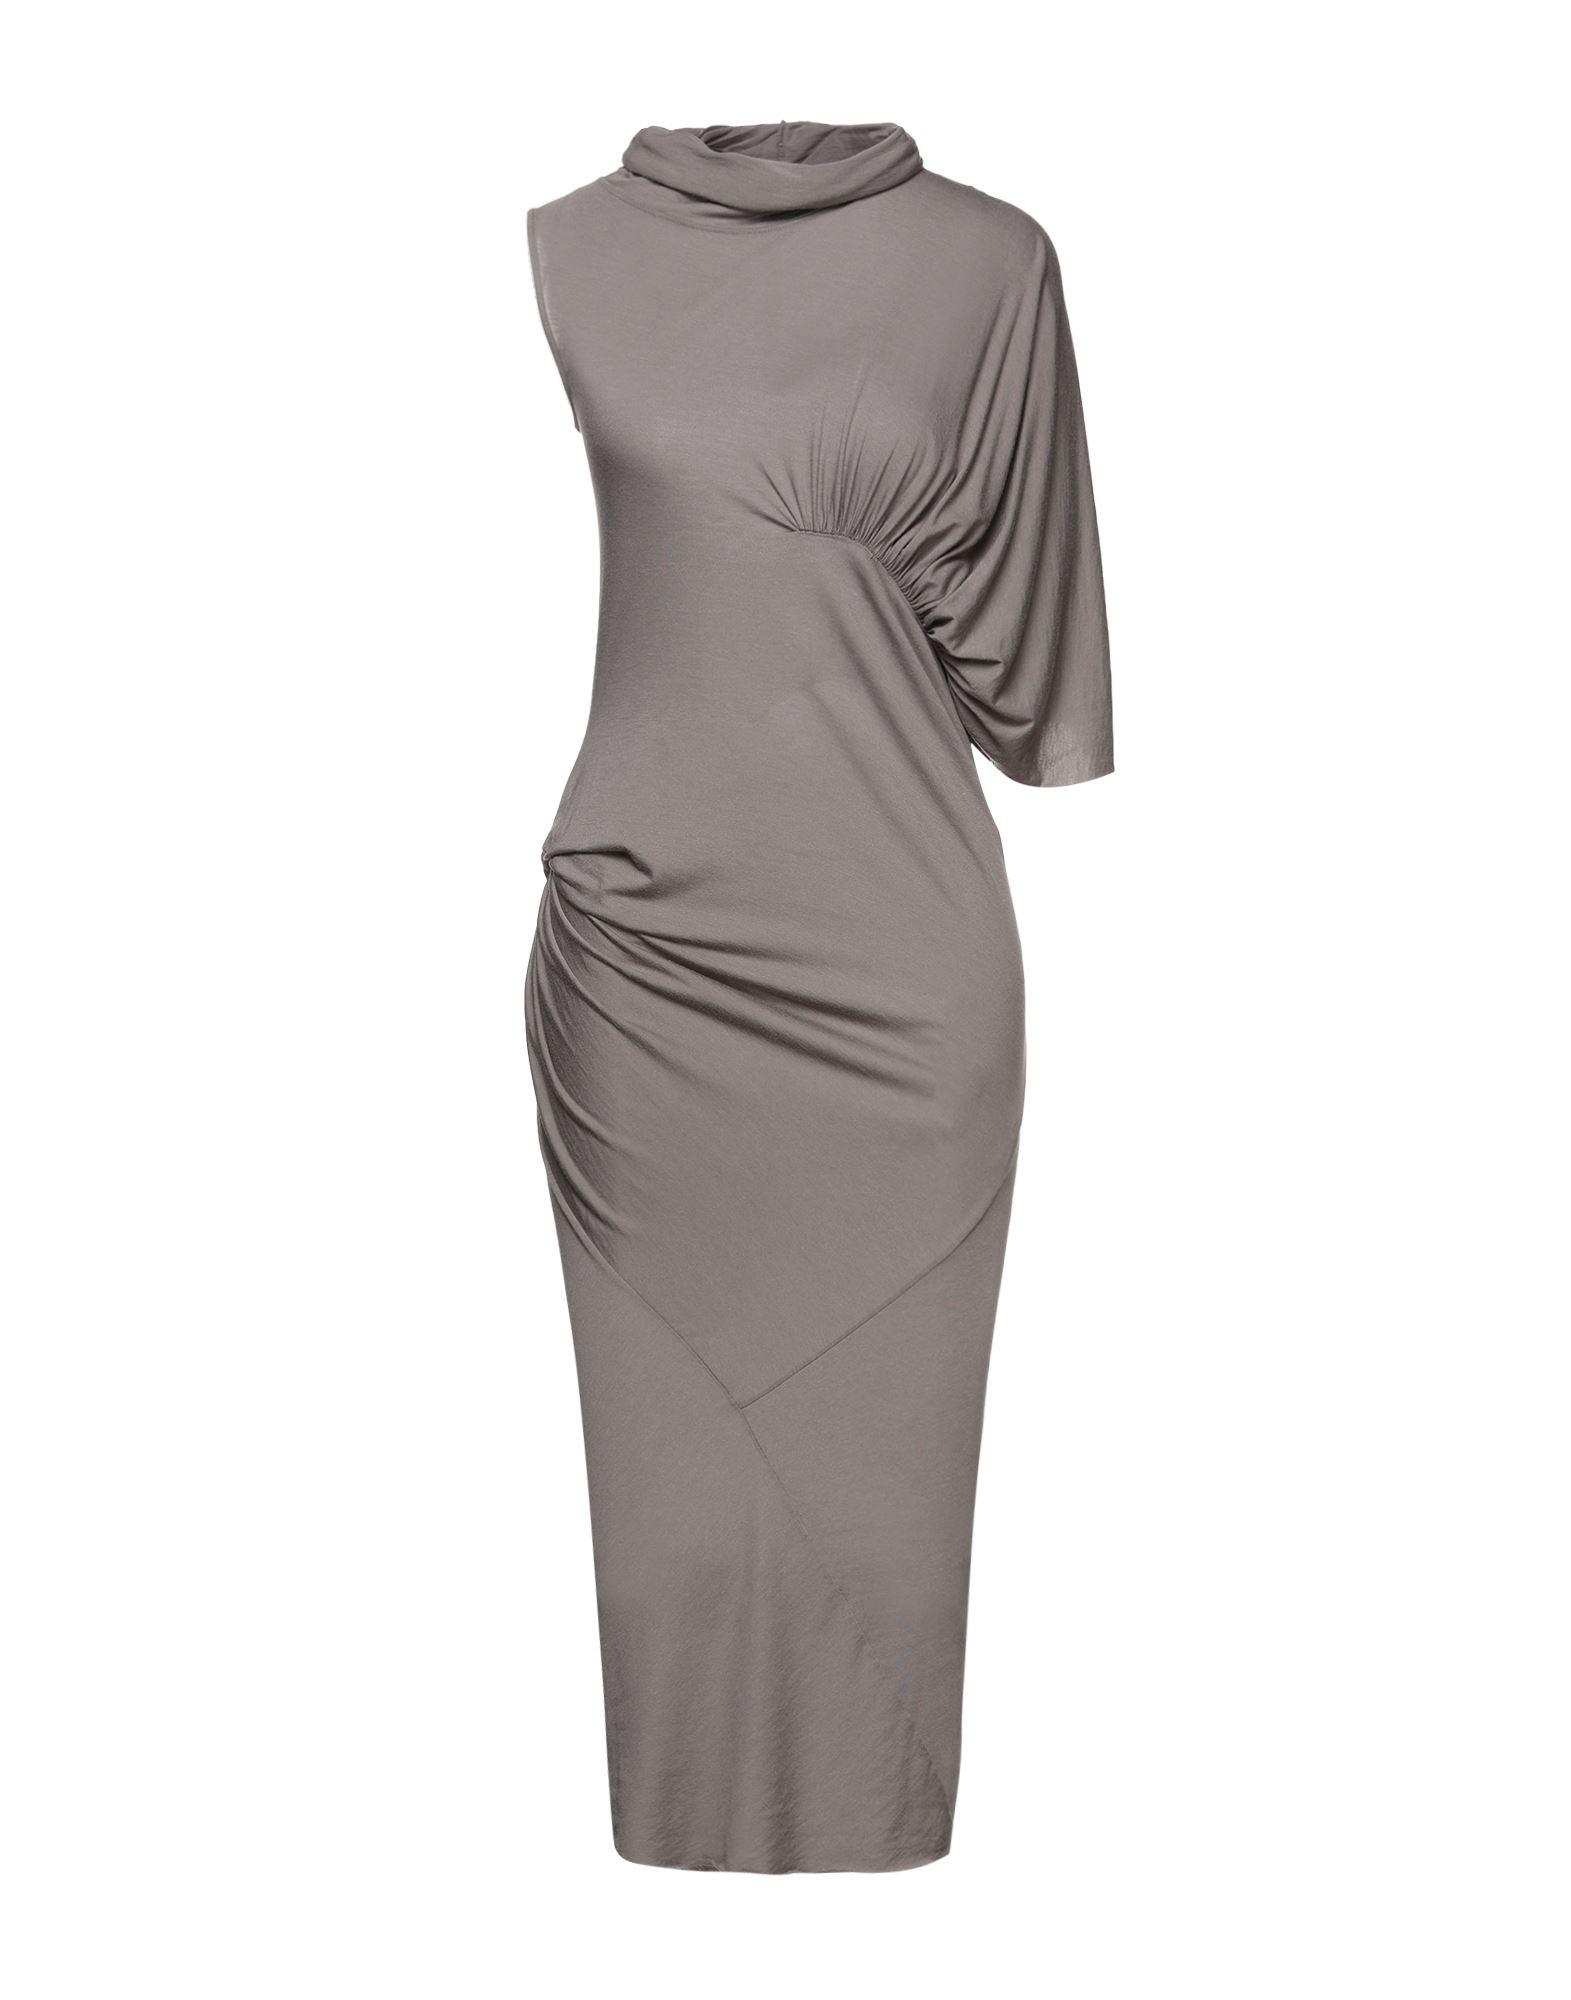 Фото - RICK OWENS LILIES Платье длиной 3/4 rick owens lilies длинное платье